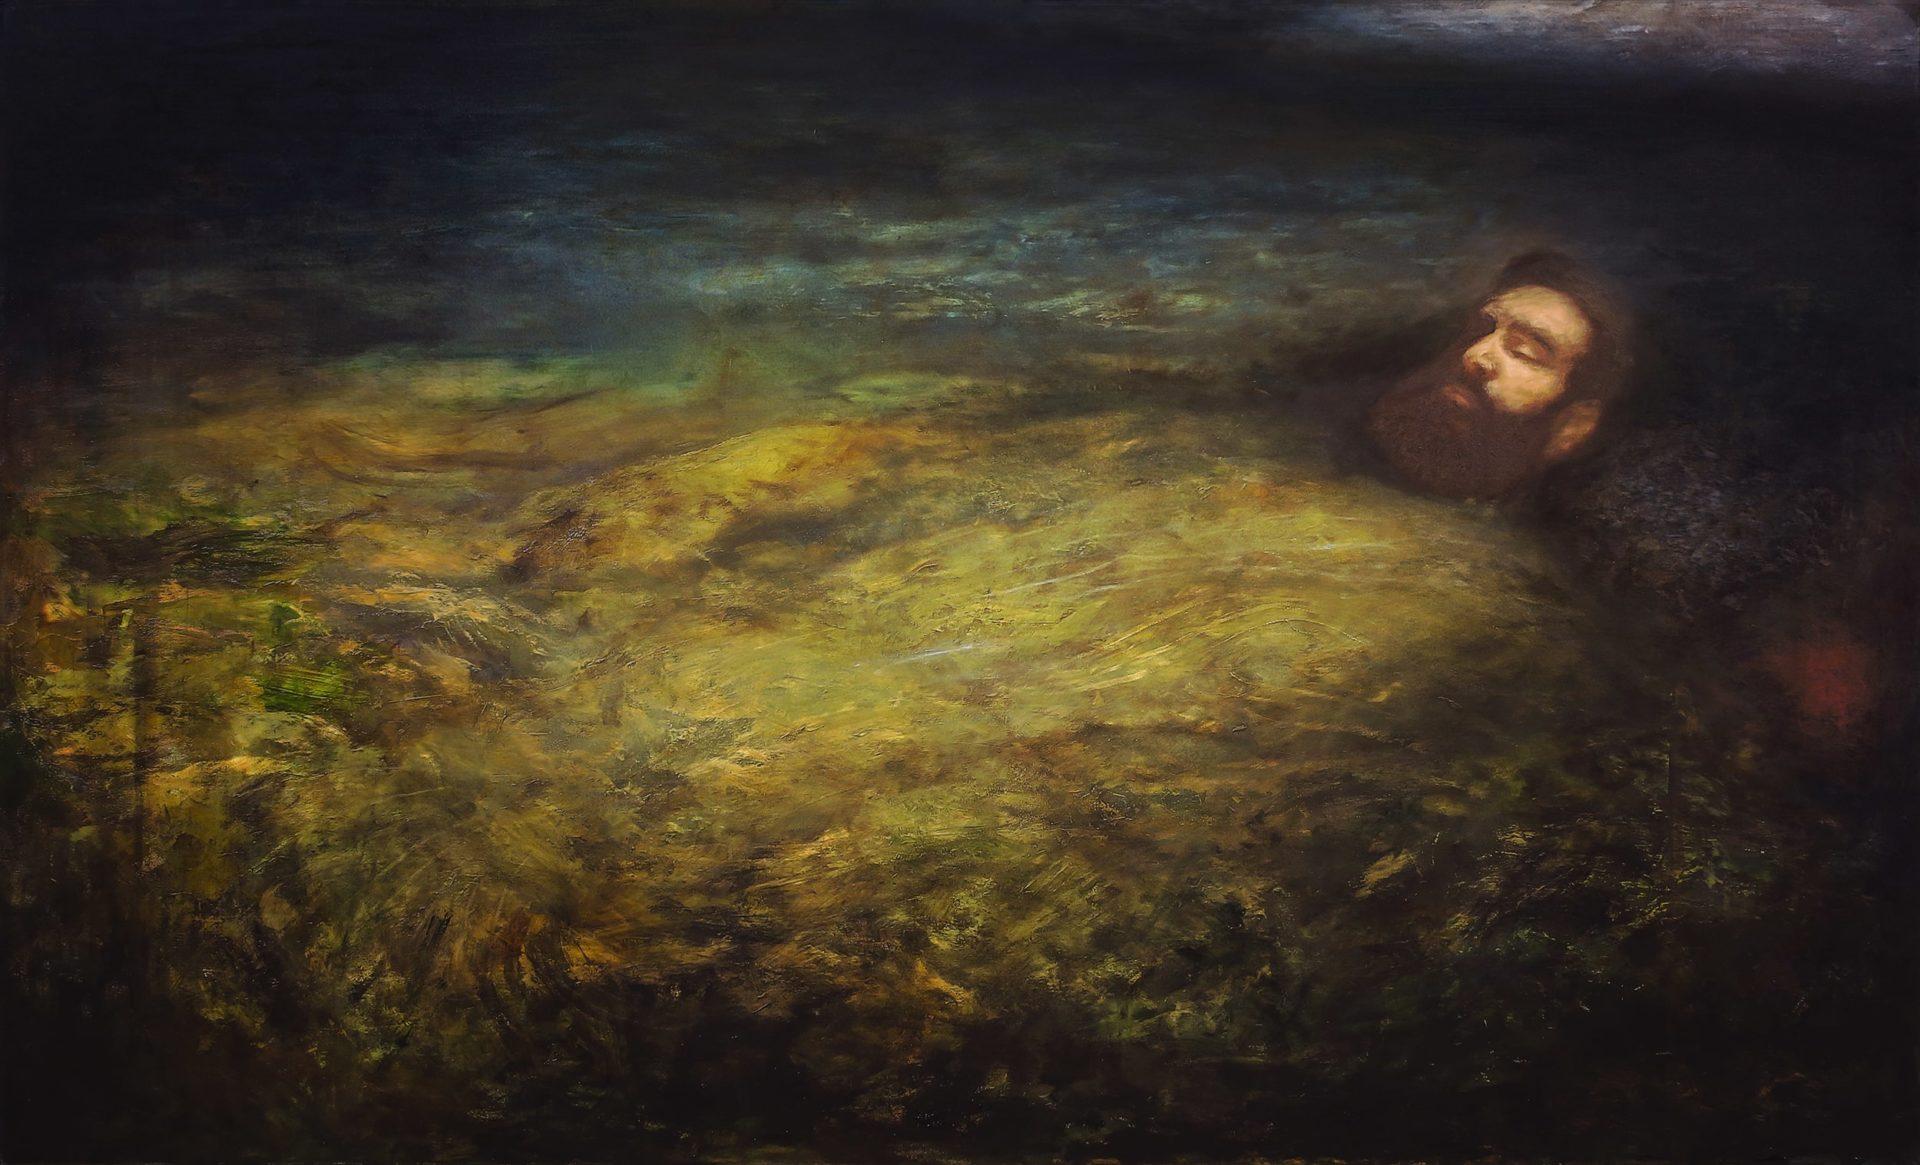 Avichai Avraham, Termination, 2020, oil on canvas